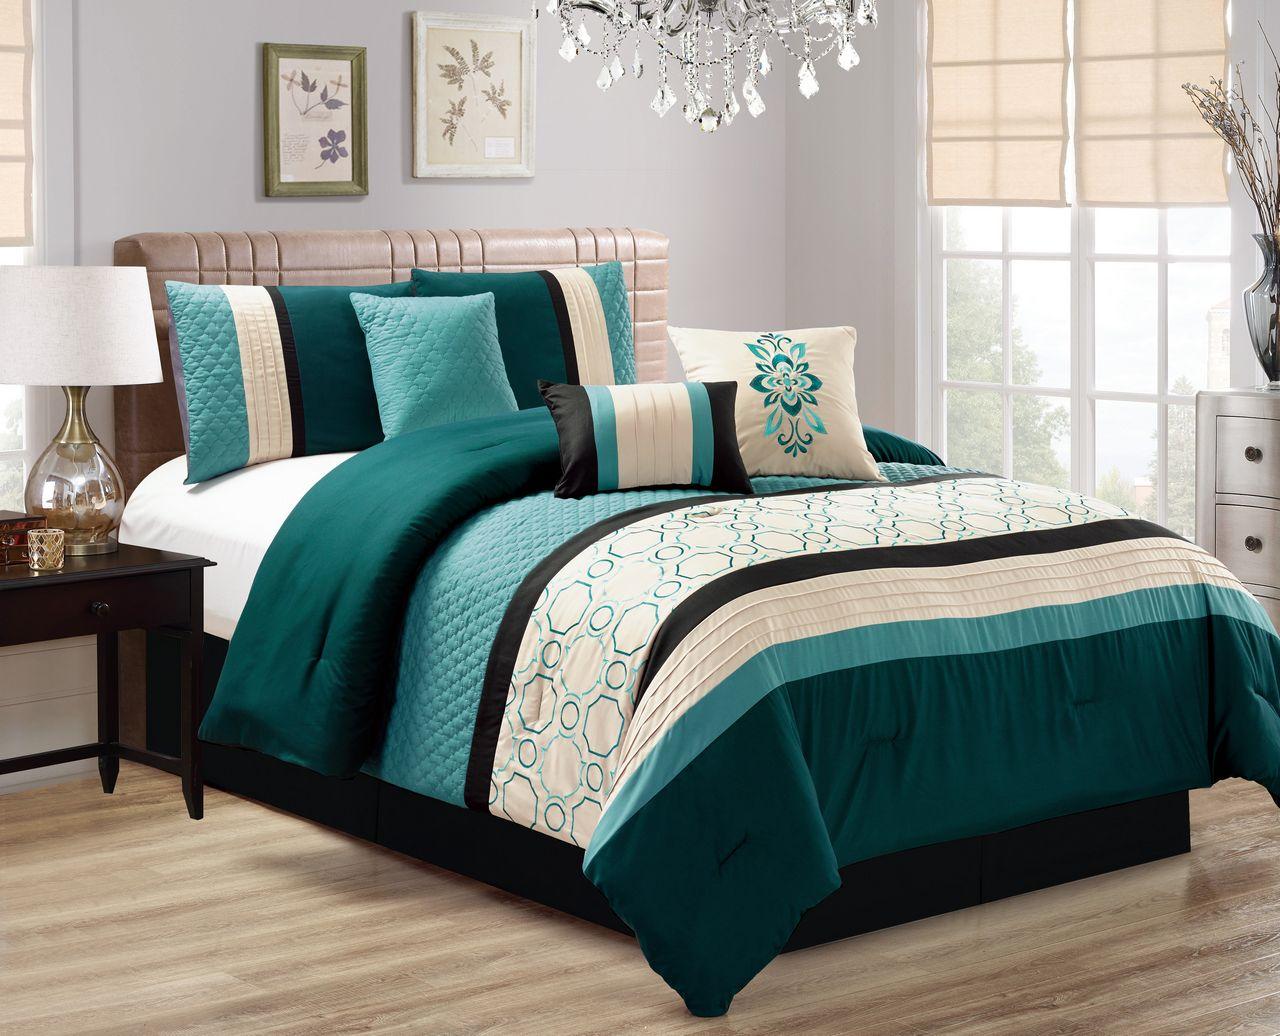 7 piece quilted geometric embroidered teal ivory black comforter set ebay. Black Bedroom Furniture Sets. Home Design Ideas